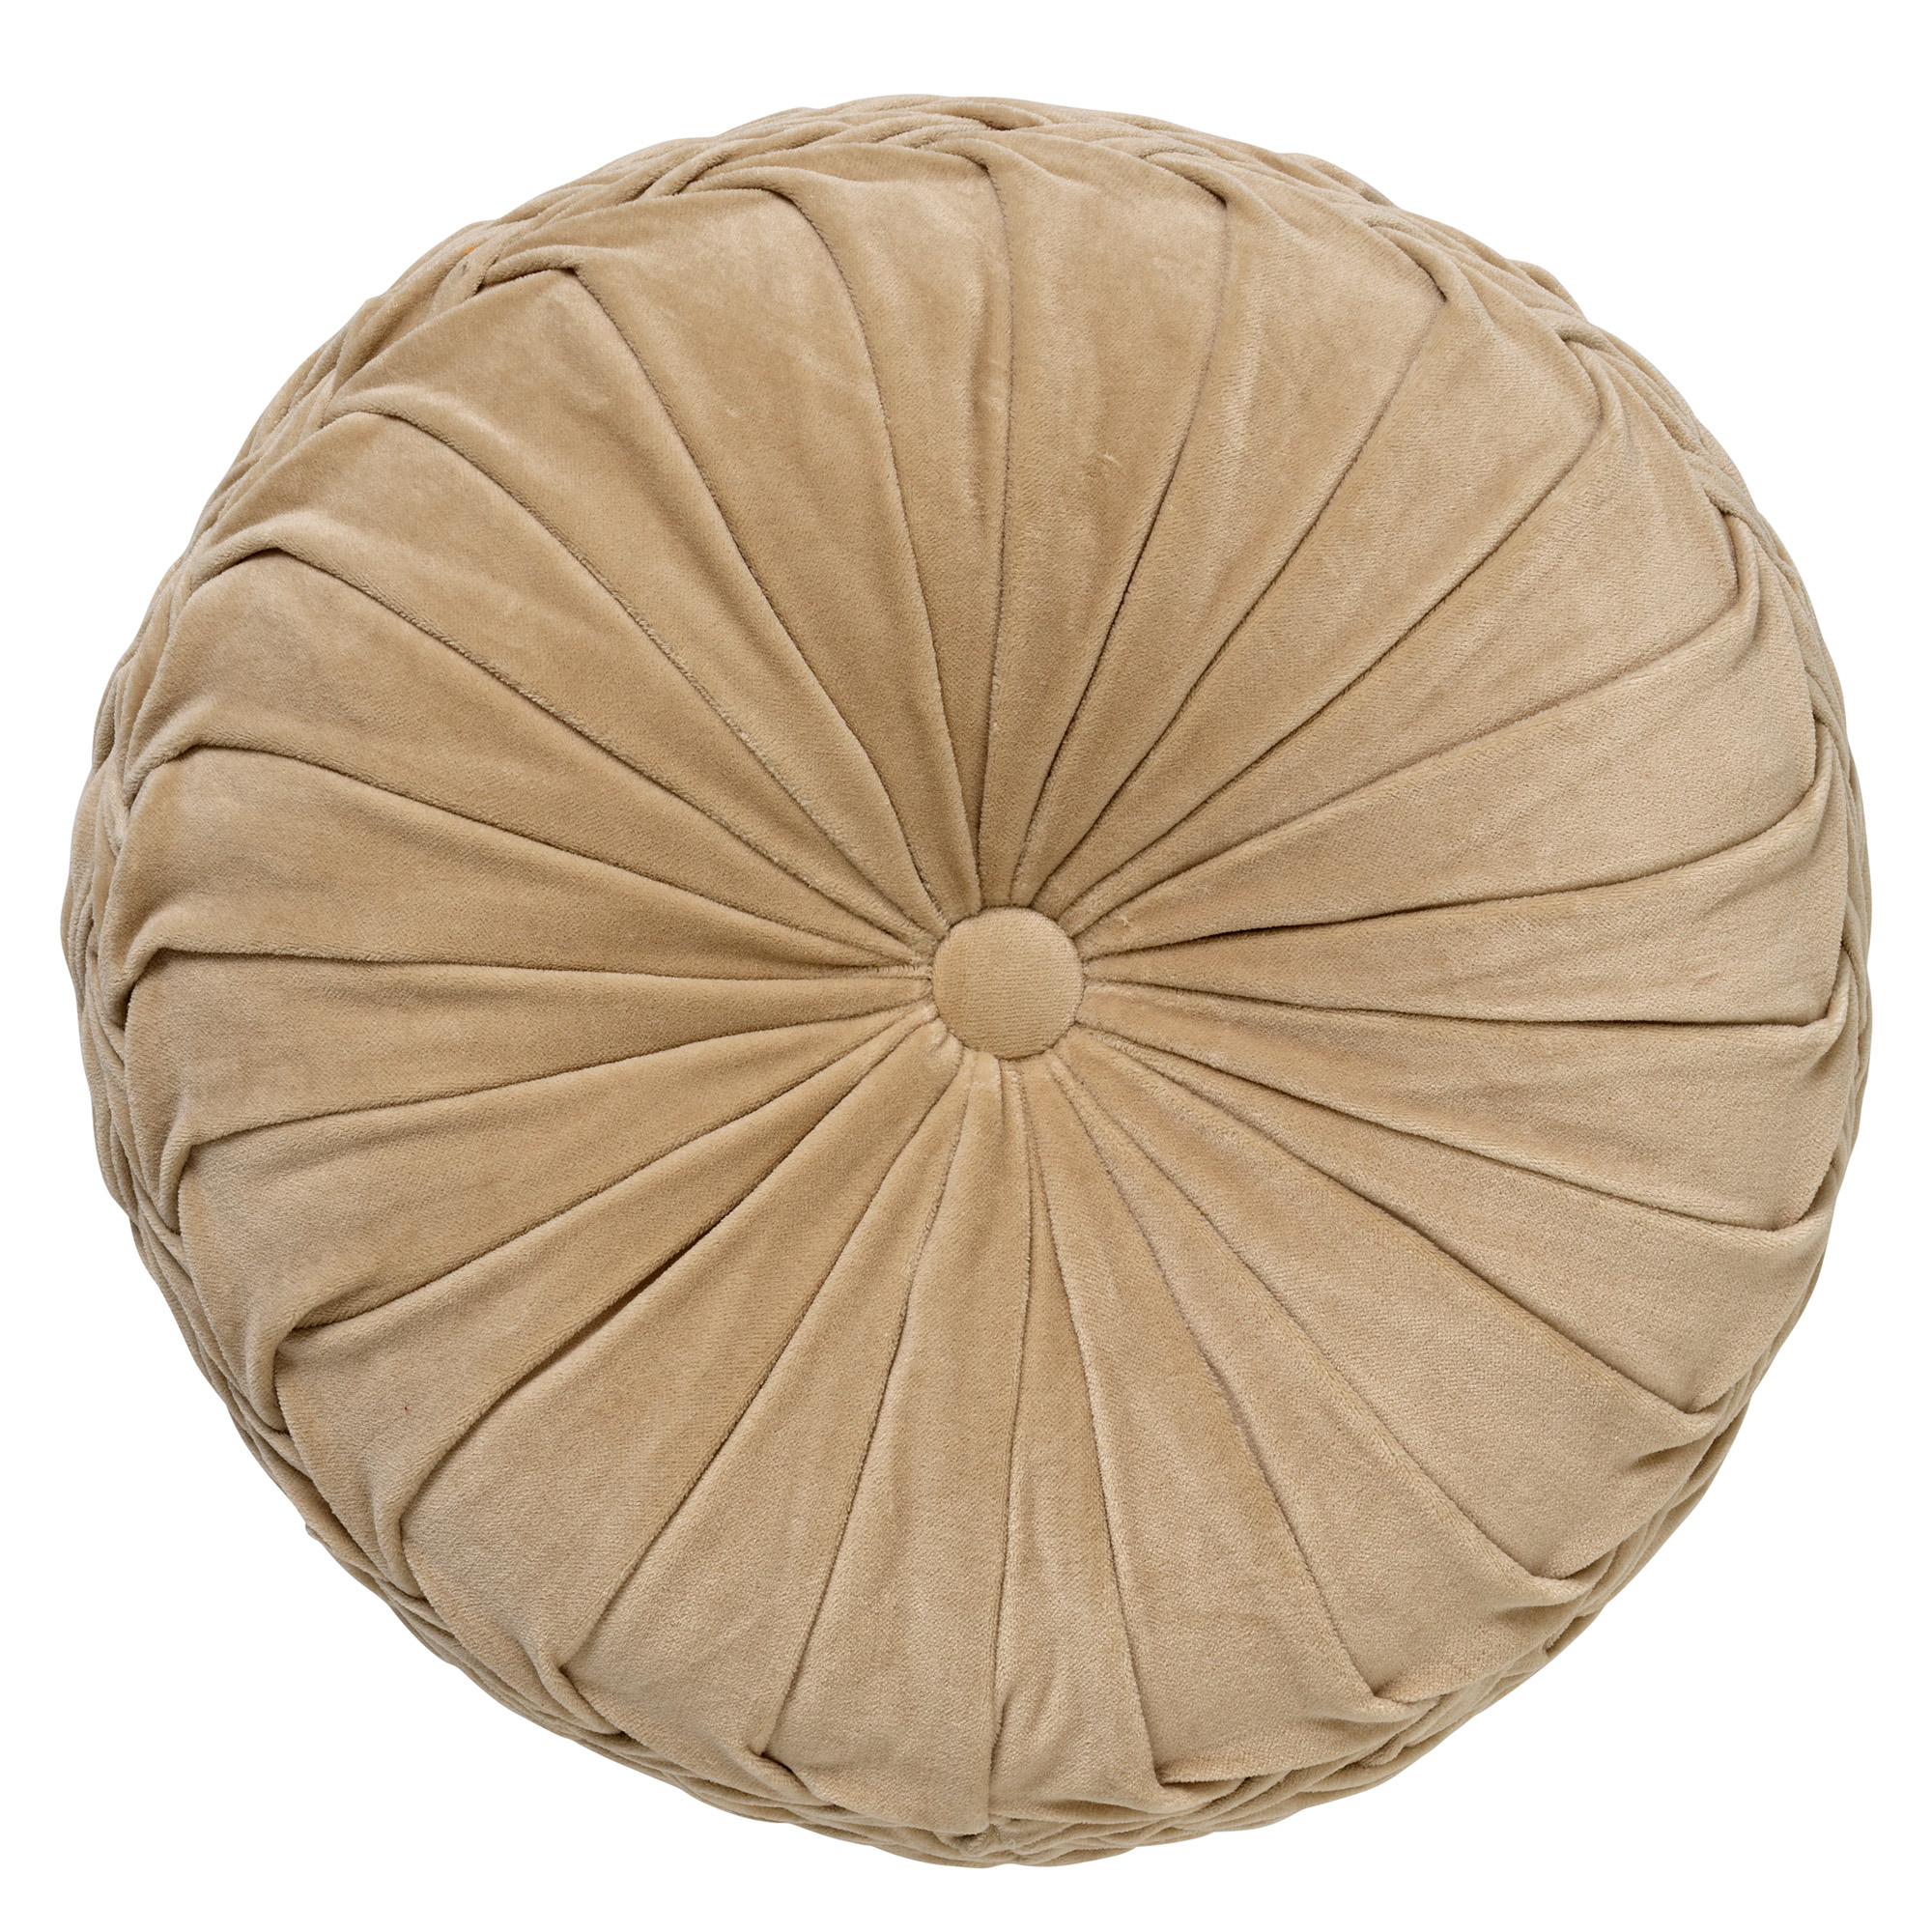 KAJA - Sierkussen rond velvet Pumice Stone 40 cm